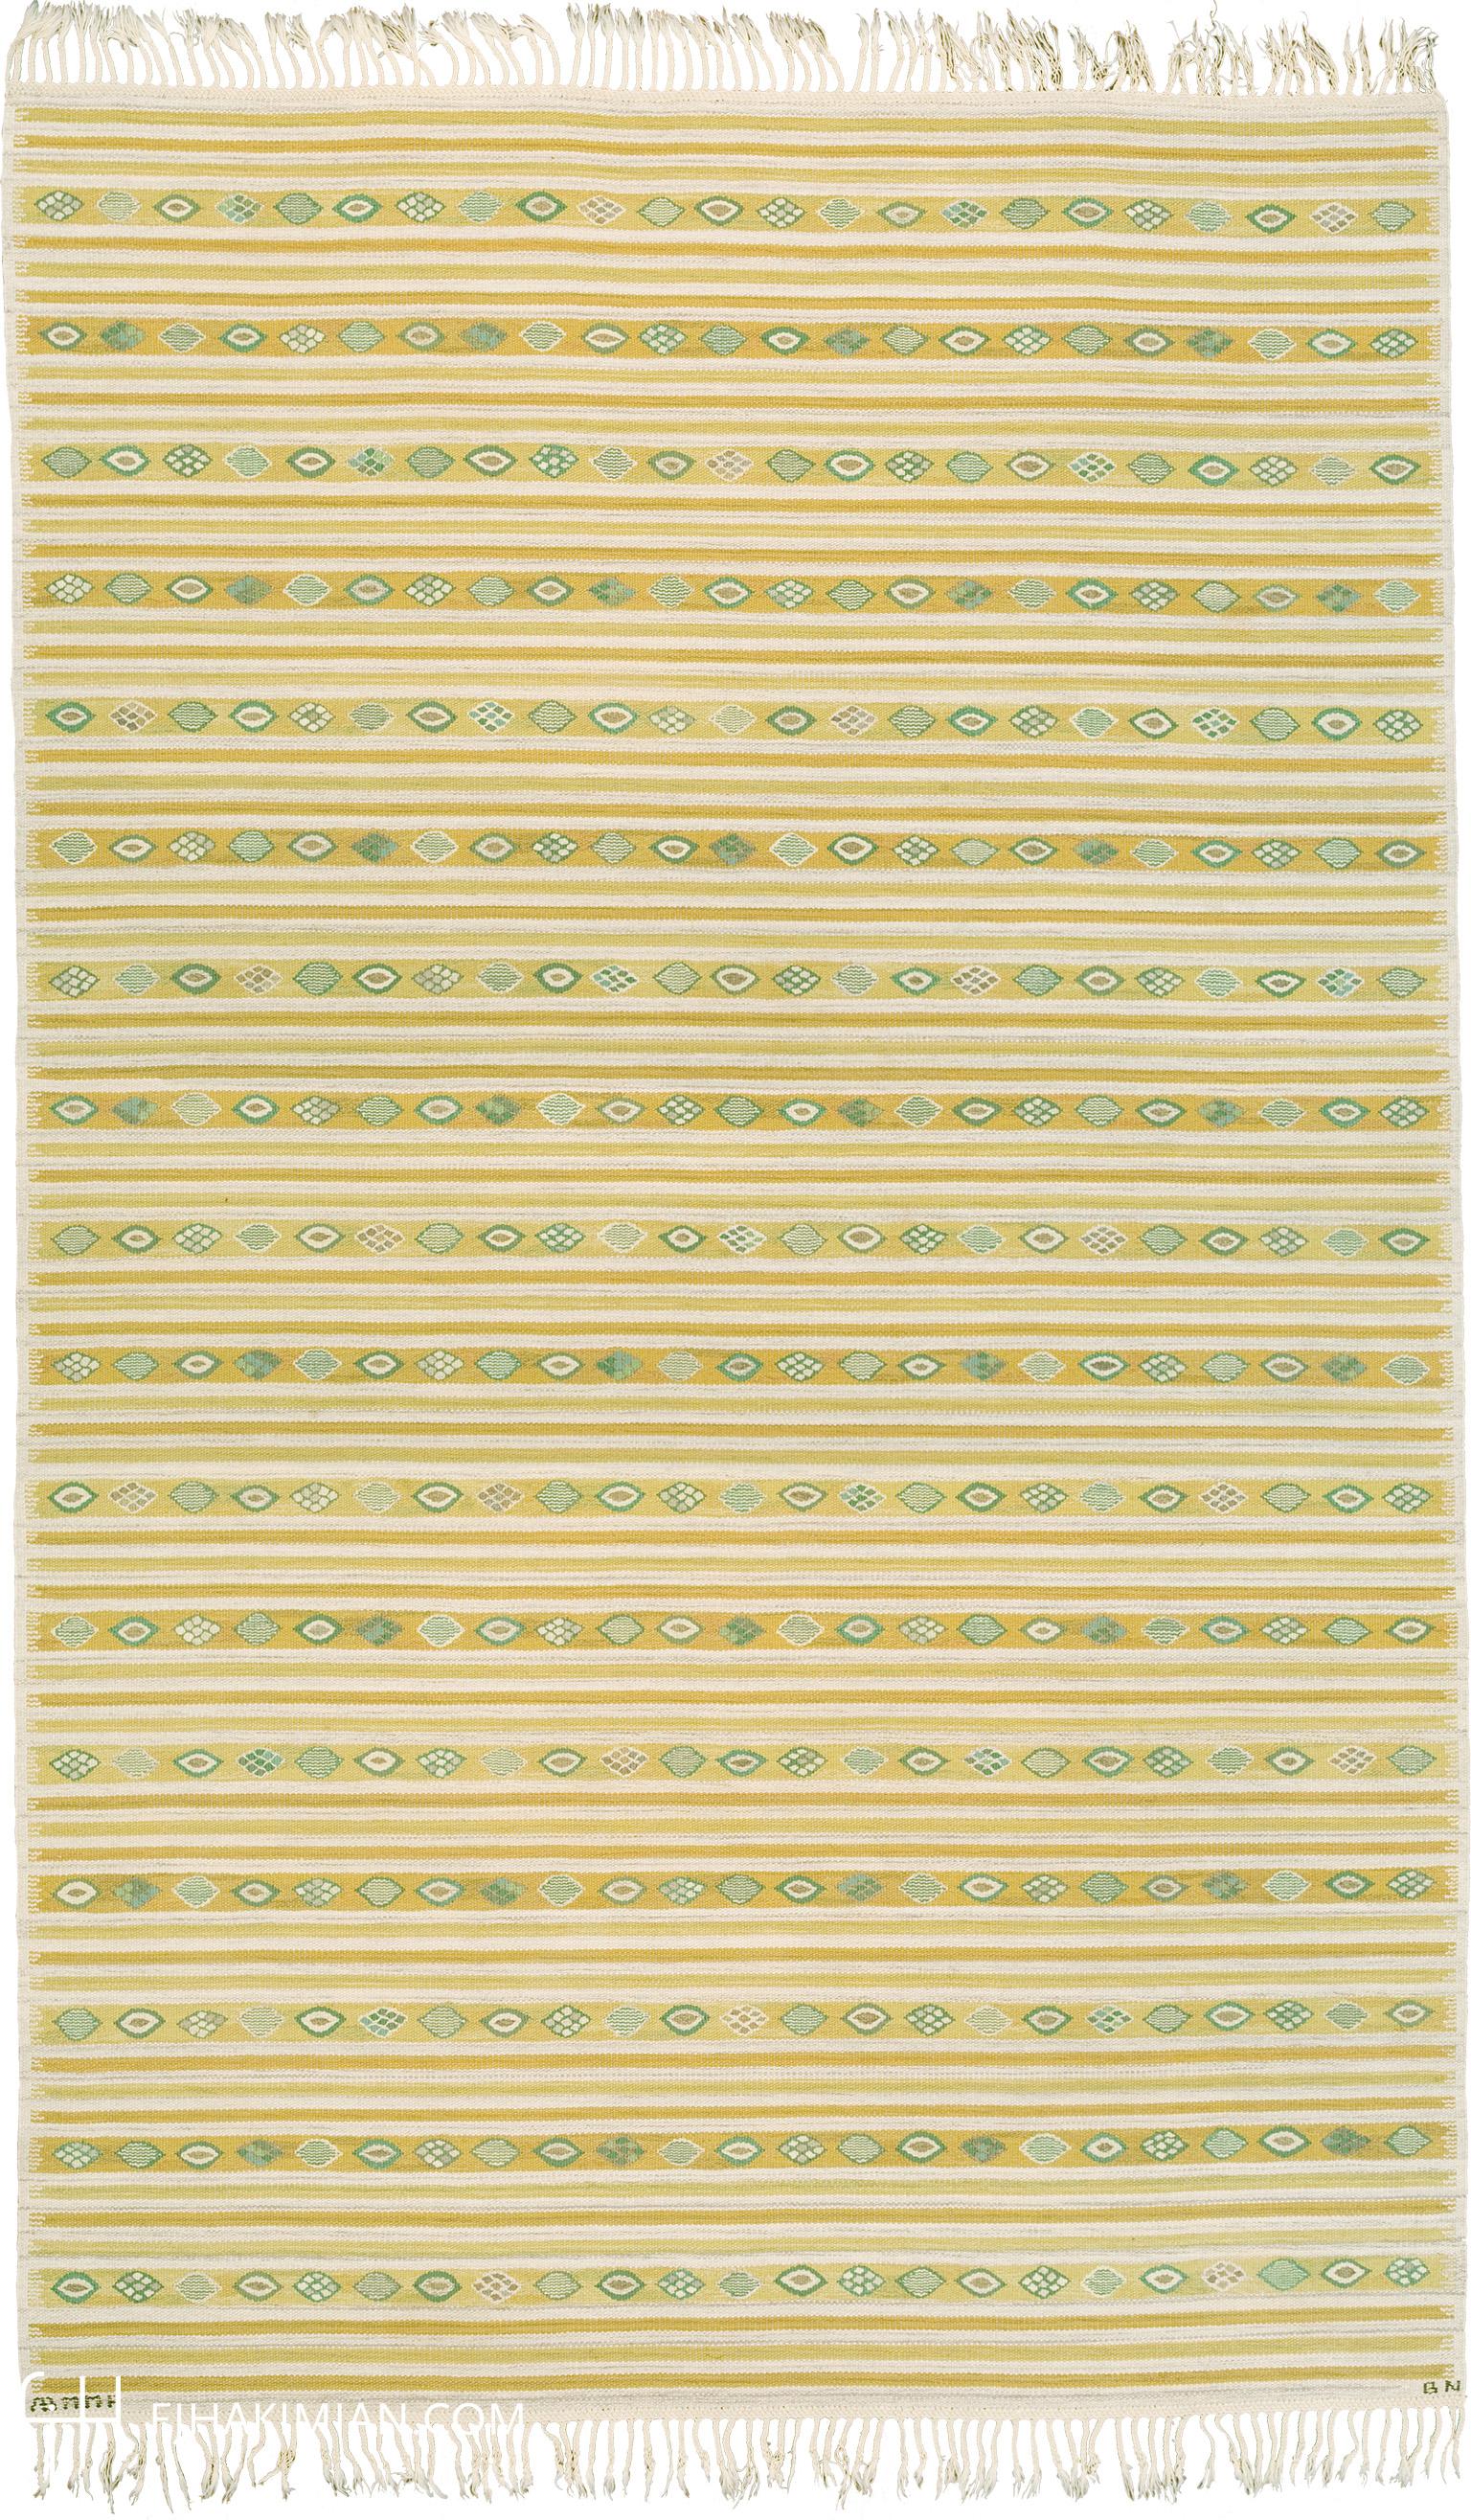 Swedish Flat Weave #22123 | FJ Hakimian